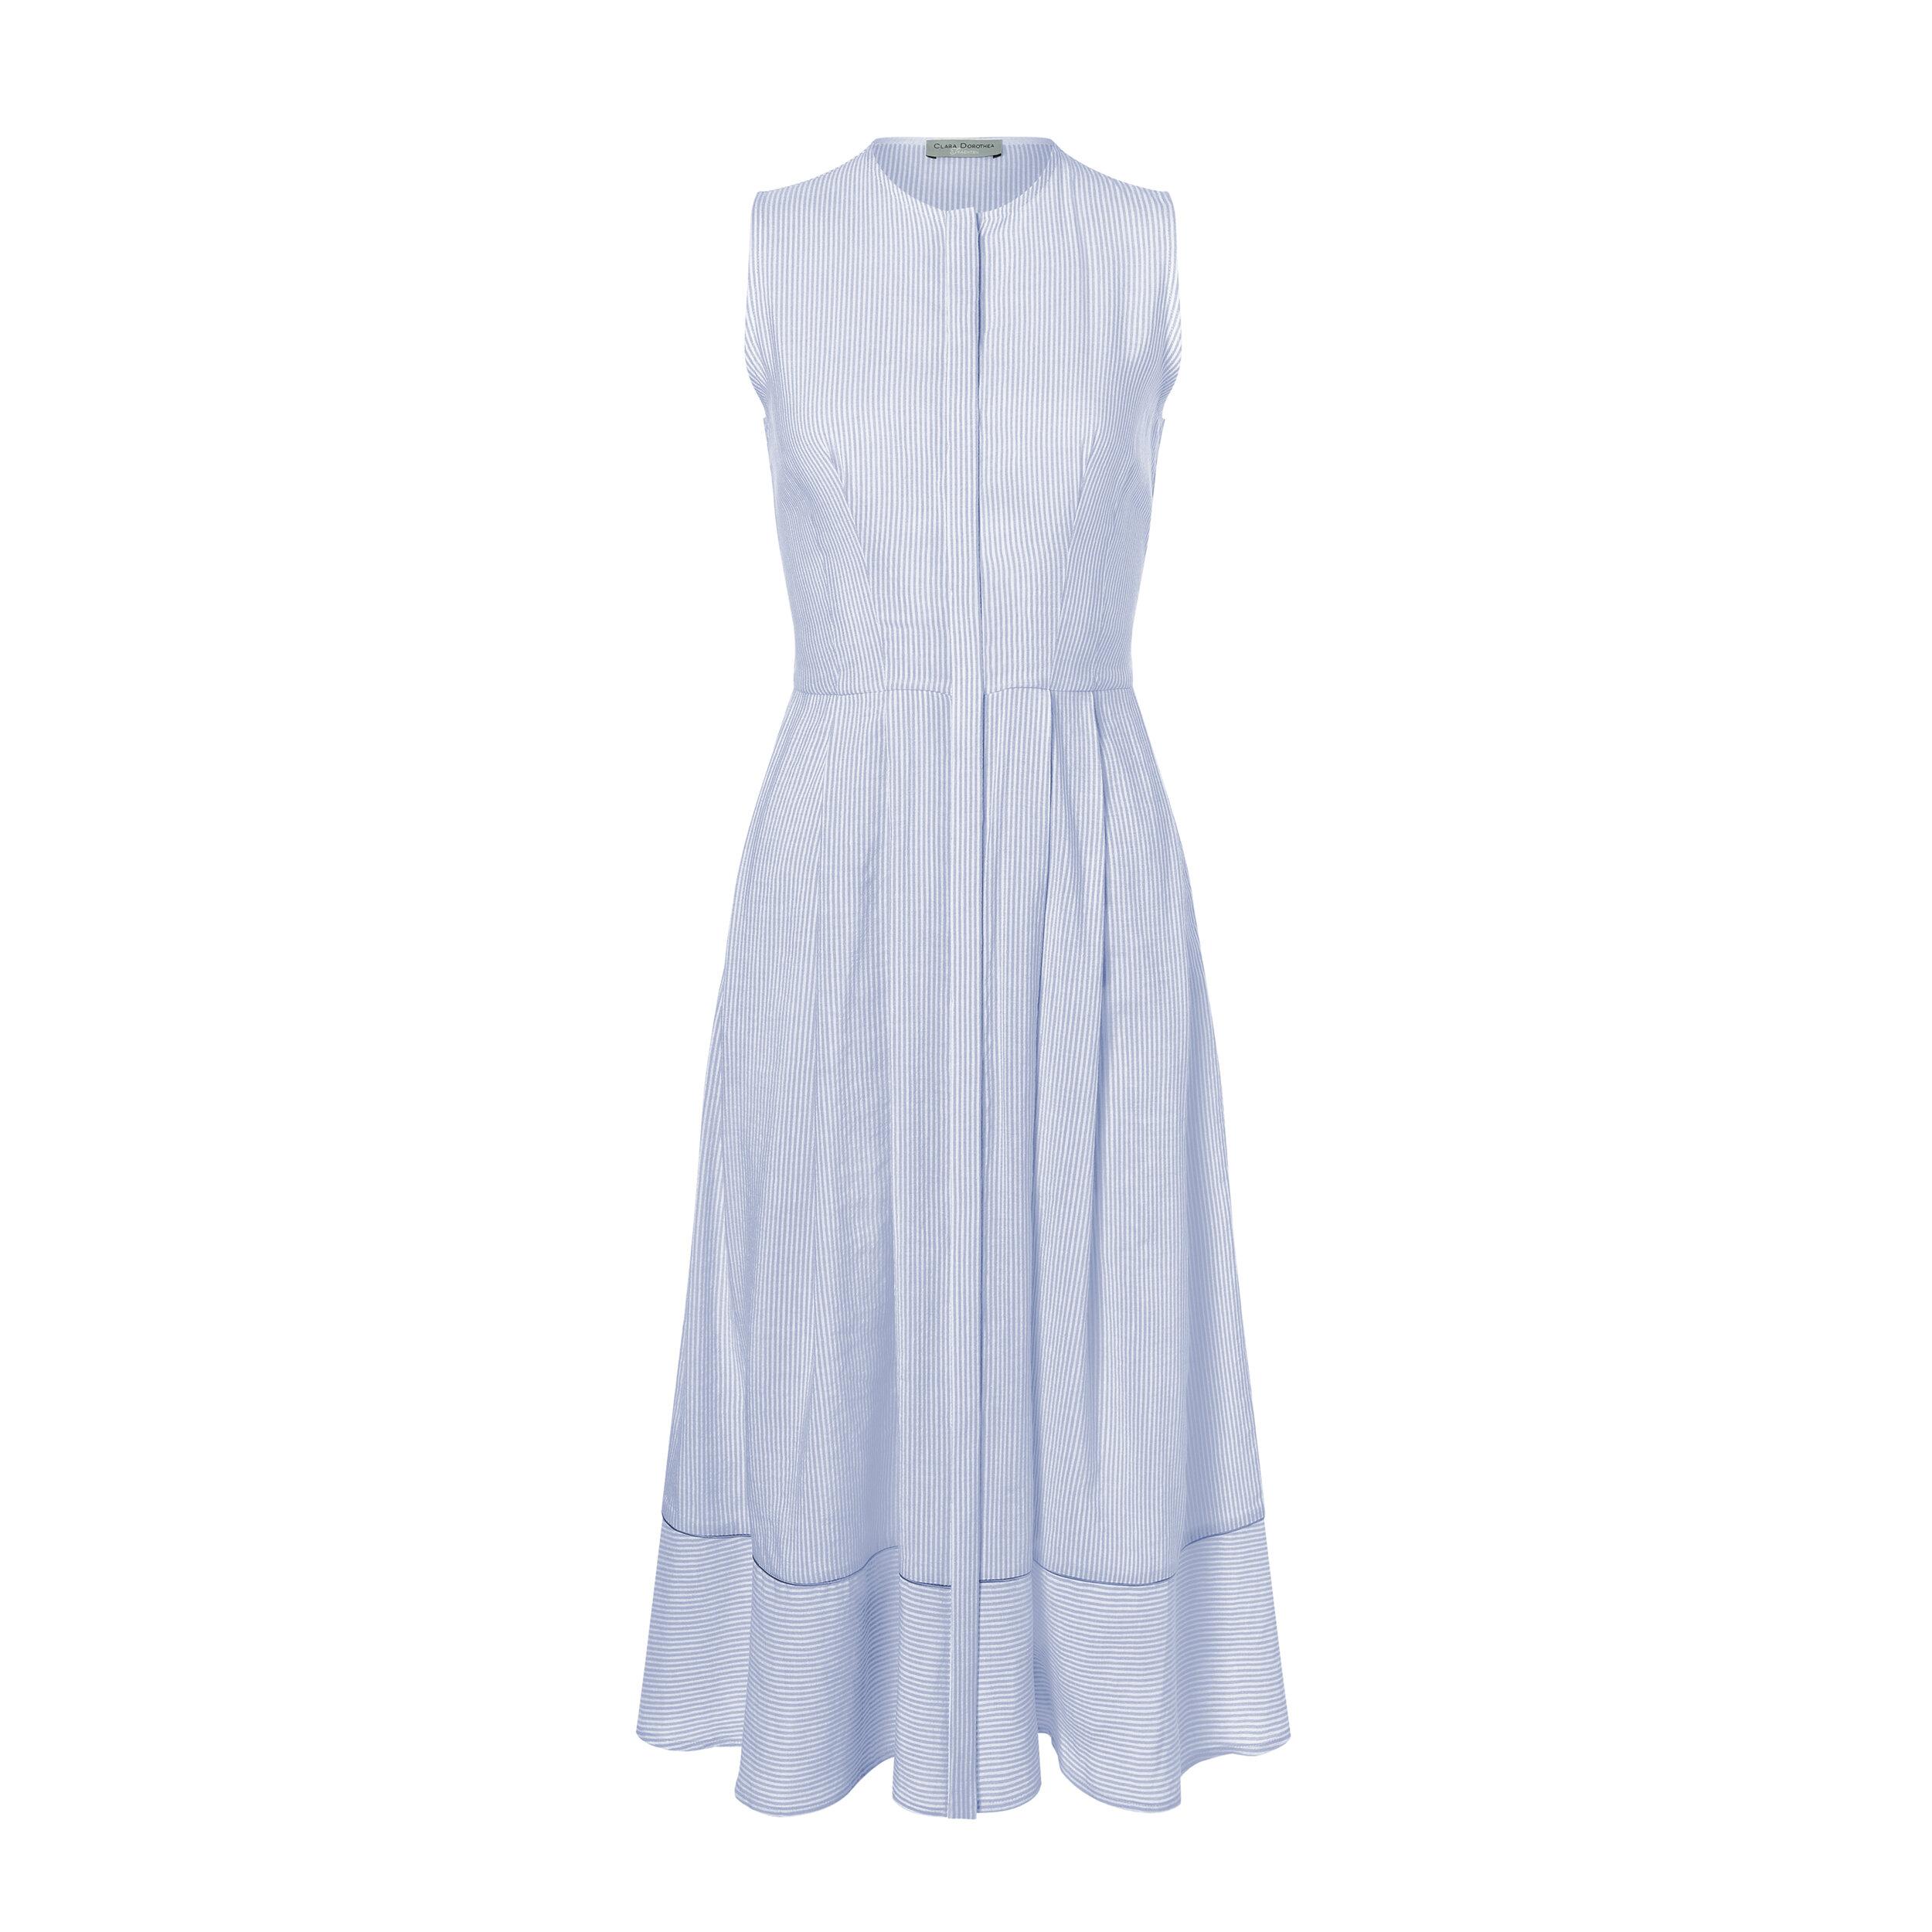 Kleid LIVIA blau/weiss lang Dirndl — Clara Dorothea